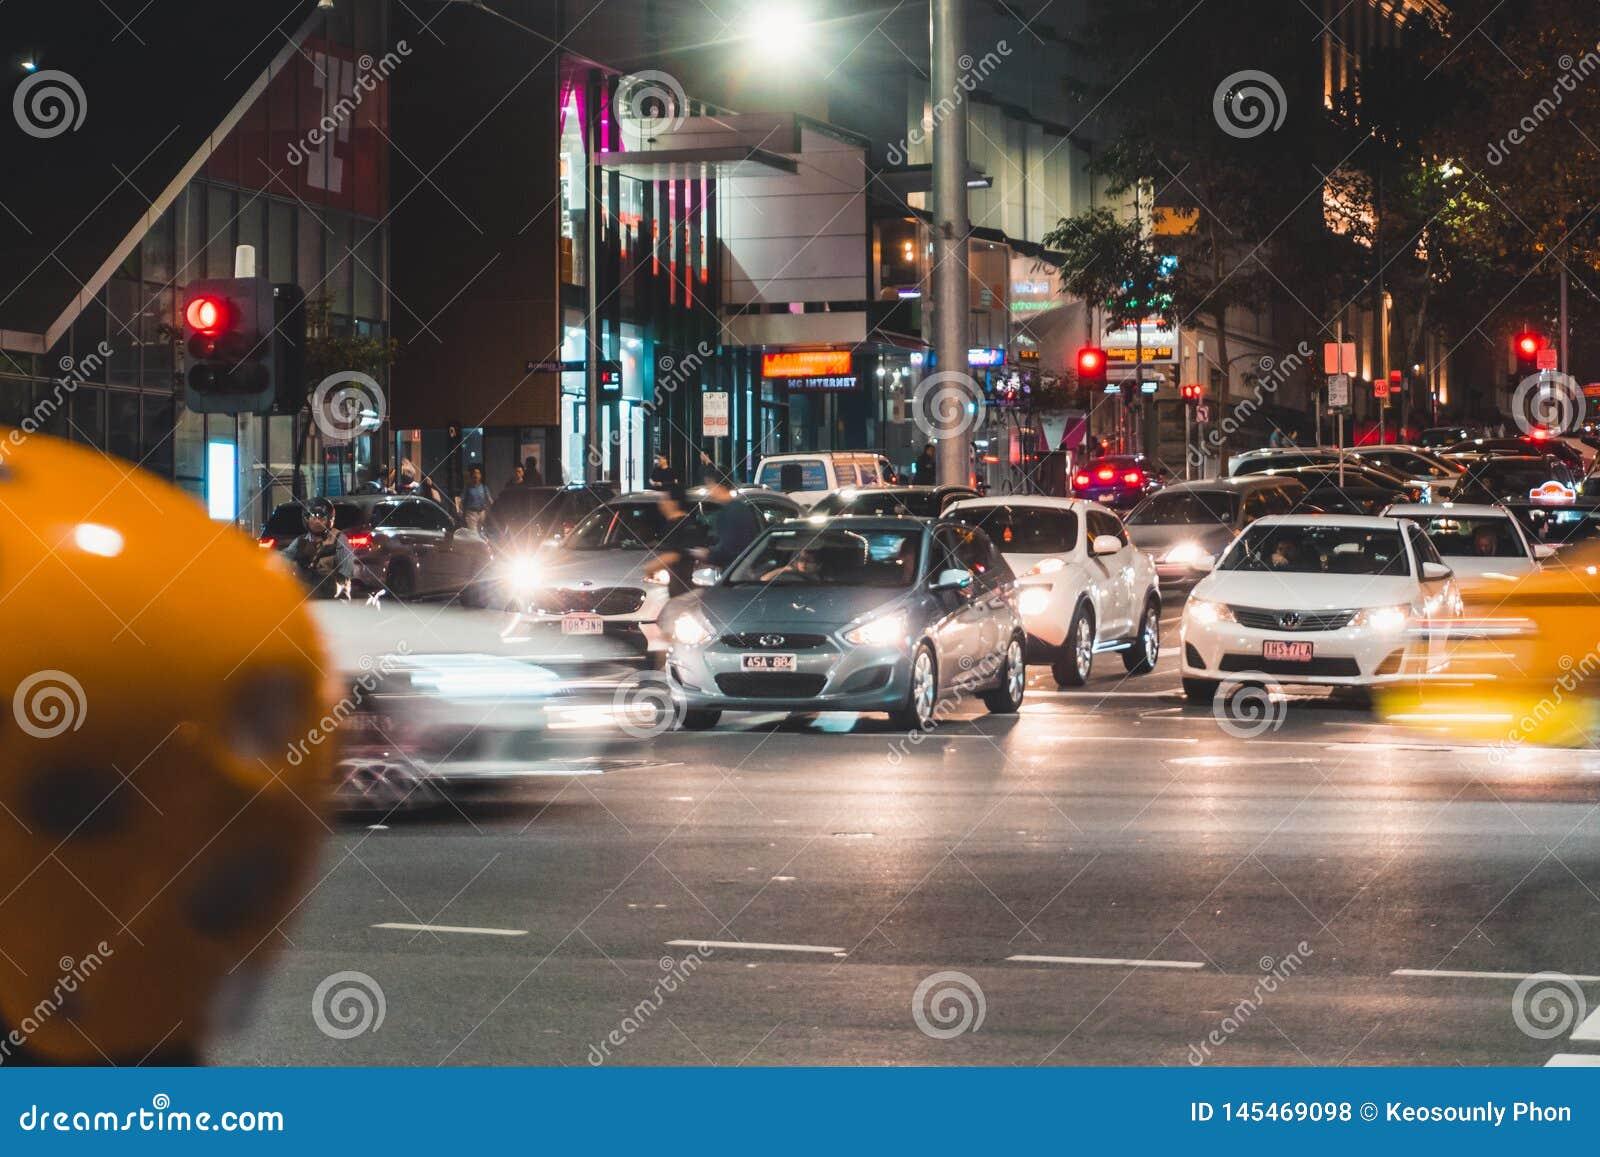 Auto s in Melbourne CBD bij Nacht